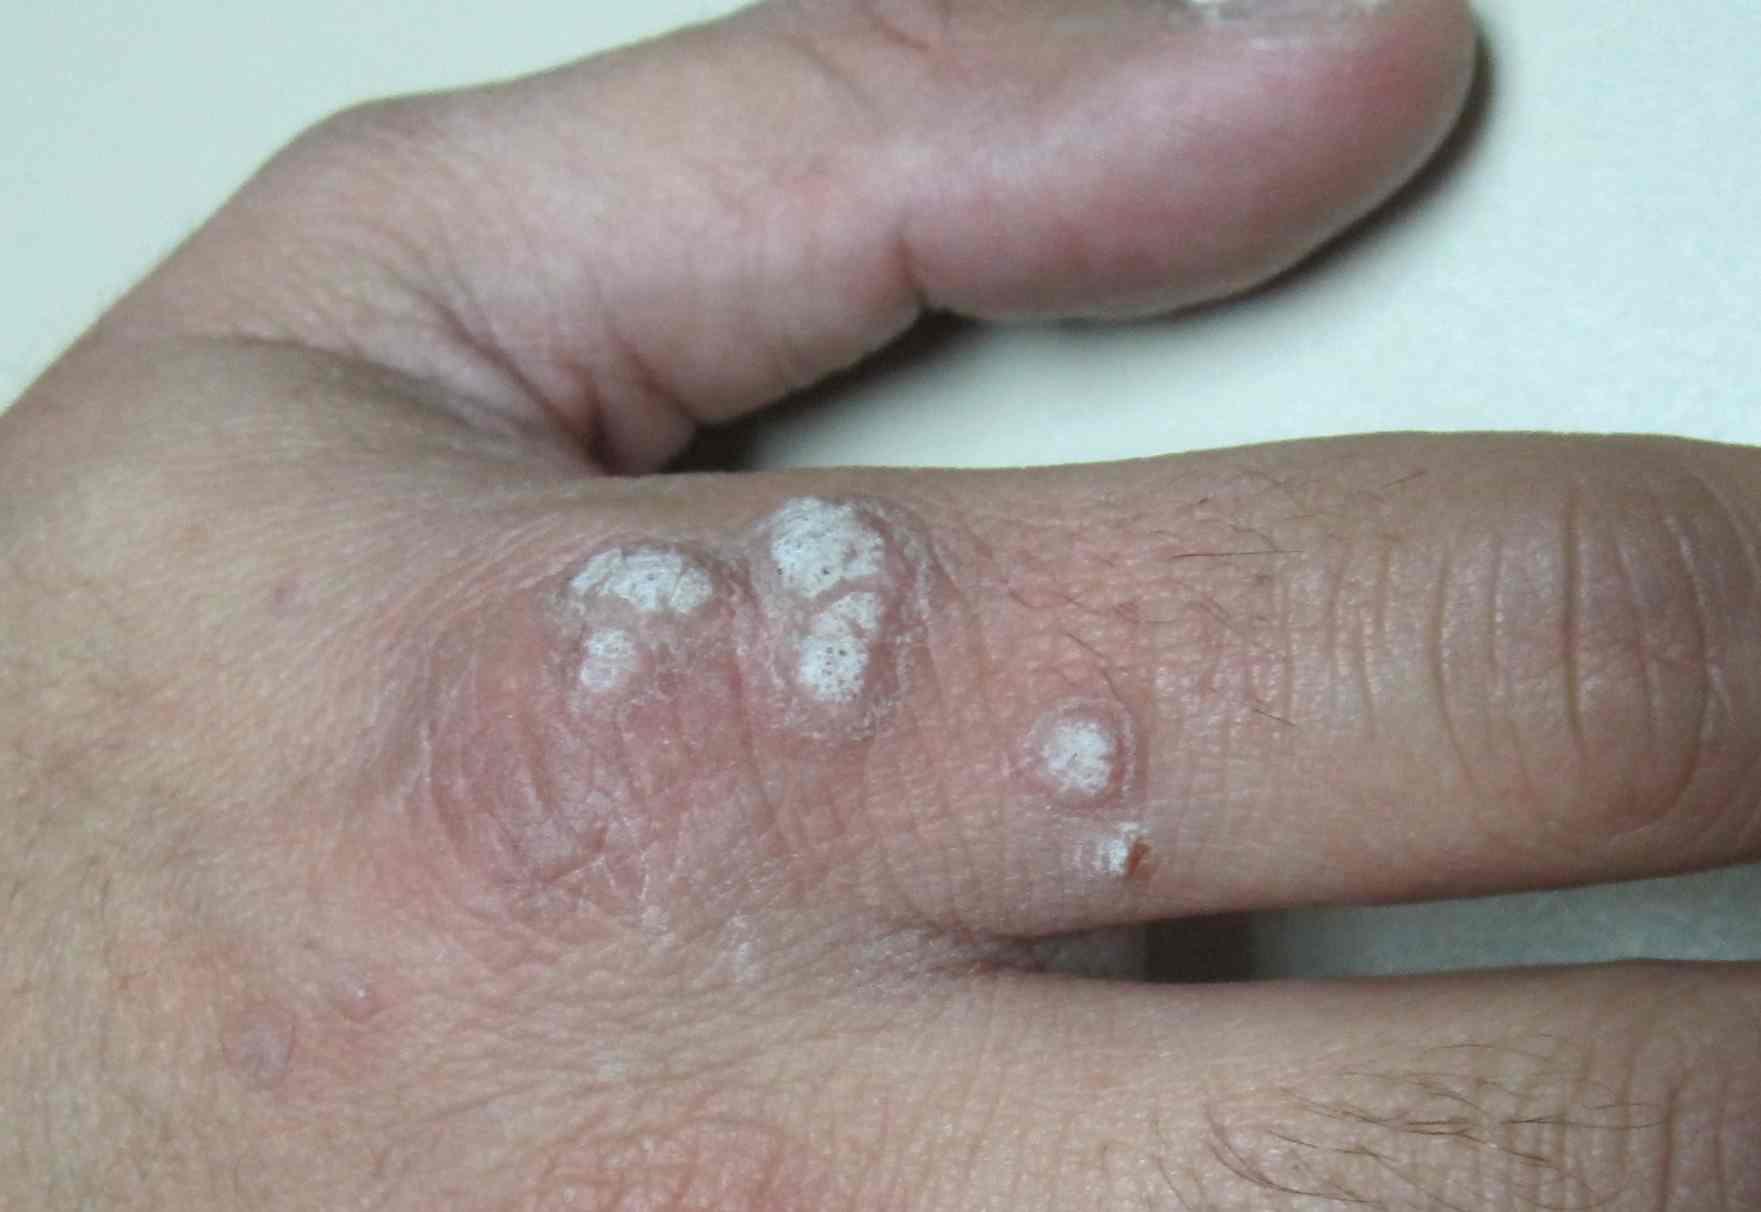 Hpv en mujeres sintomas verrugas - triplus.ro